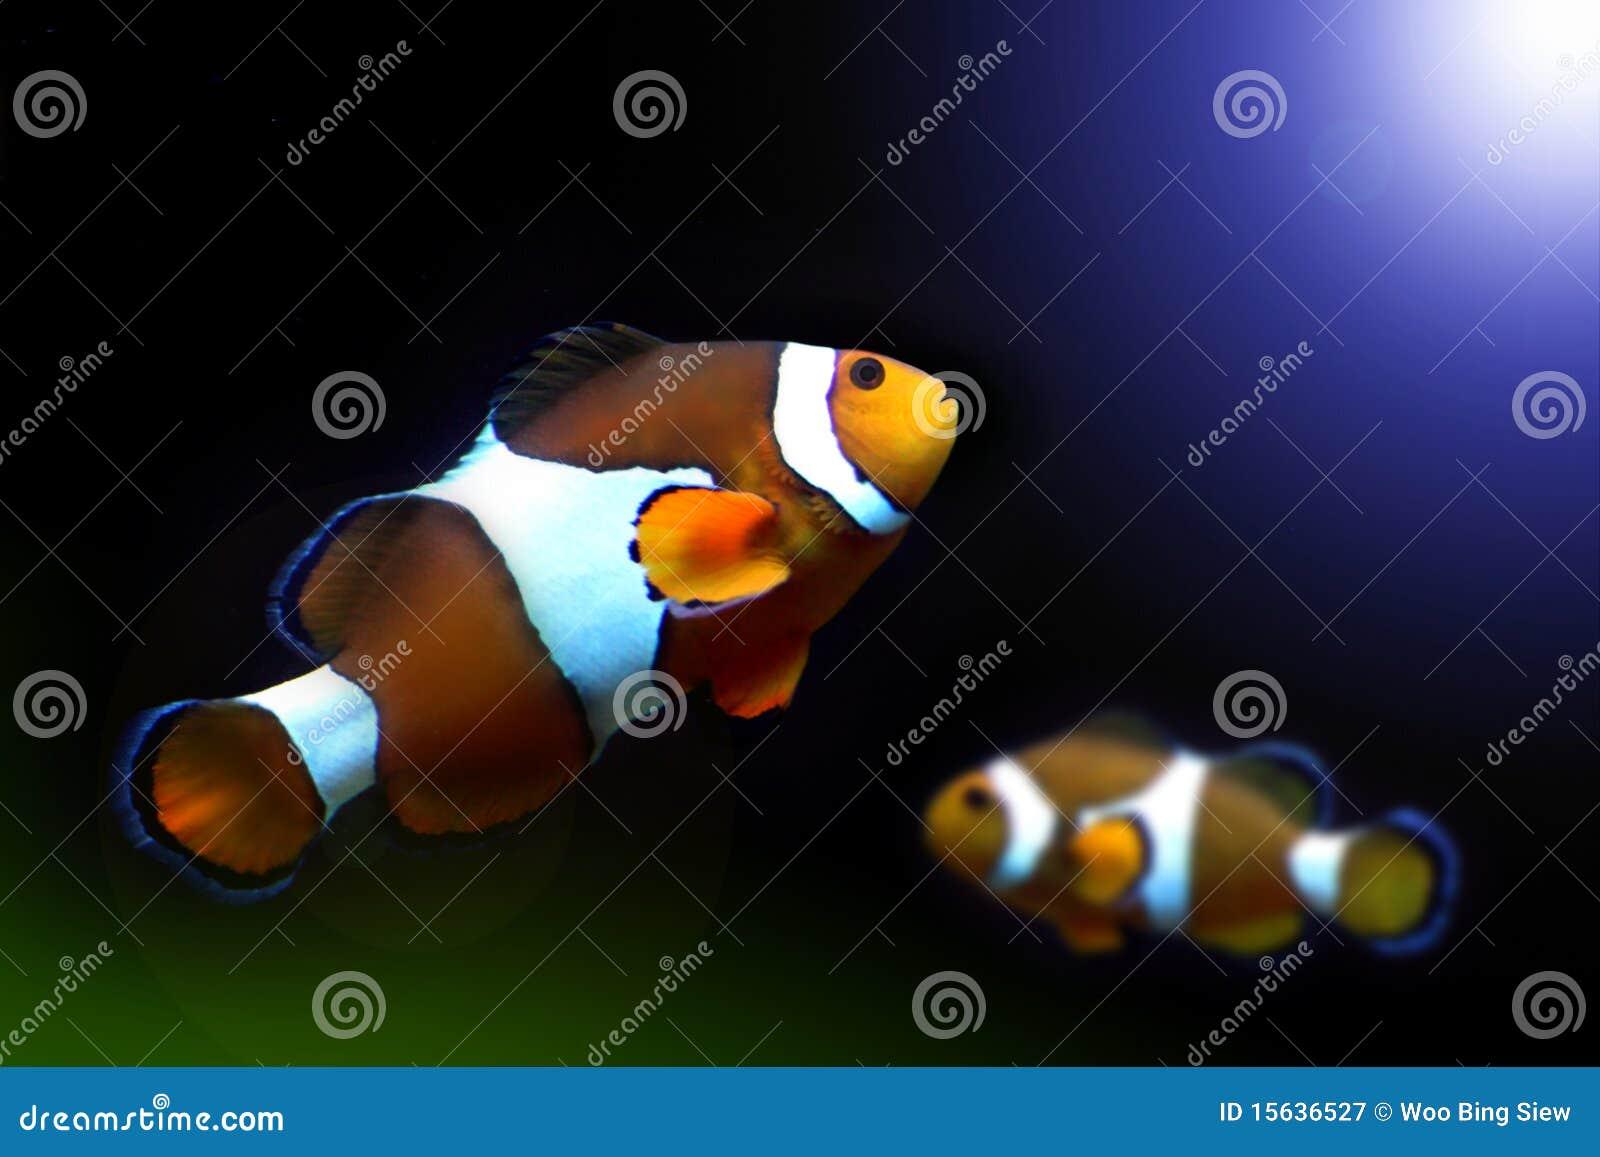 Nemo fish stock image image of aquarium lighting nature for Nemo light fish